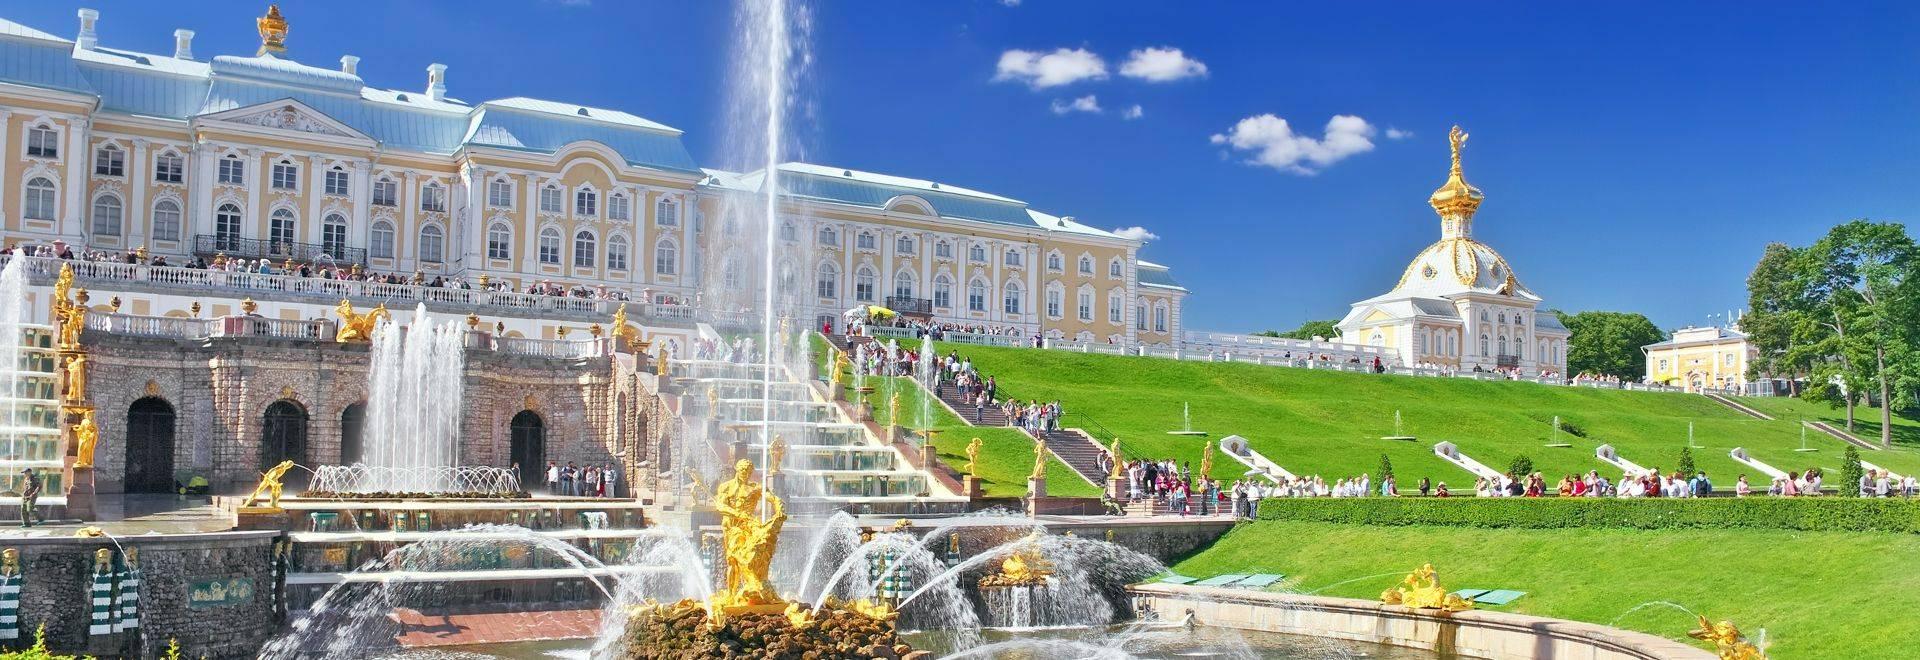 Shutterstock 113793739 Grand Cascade In Pertergof, Saint Petersburg, Russia